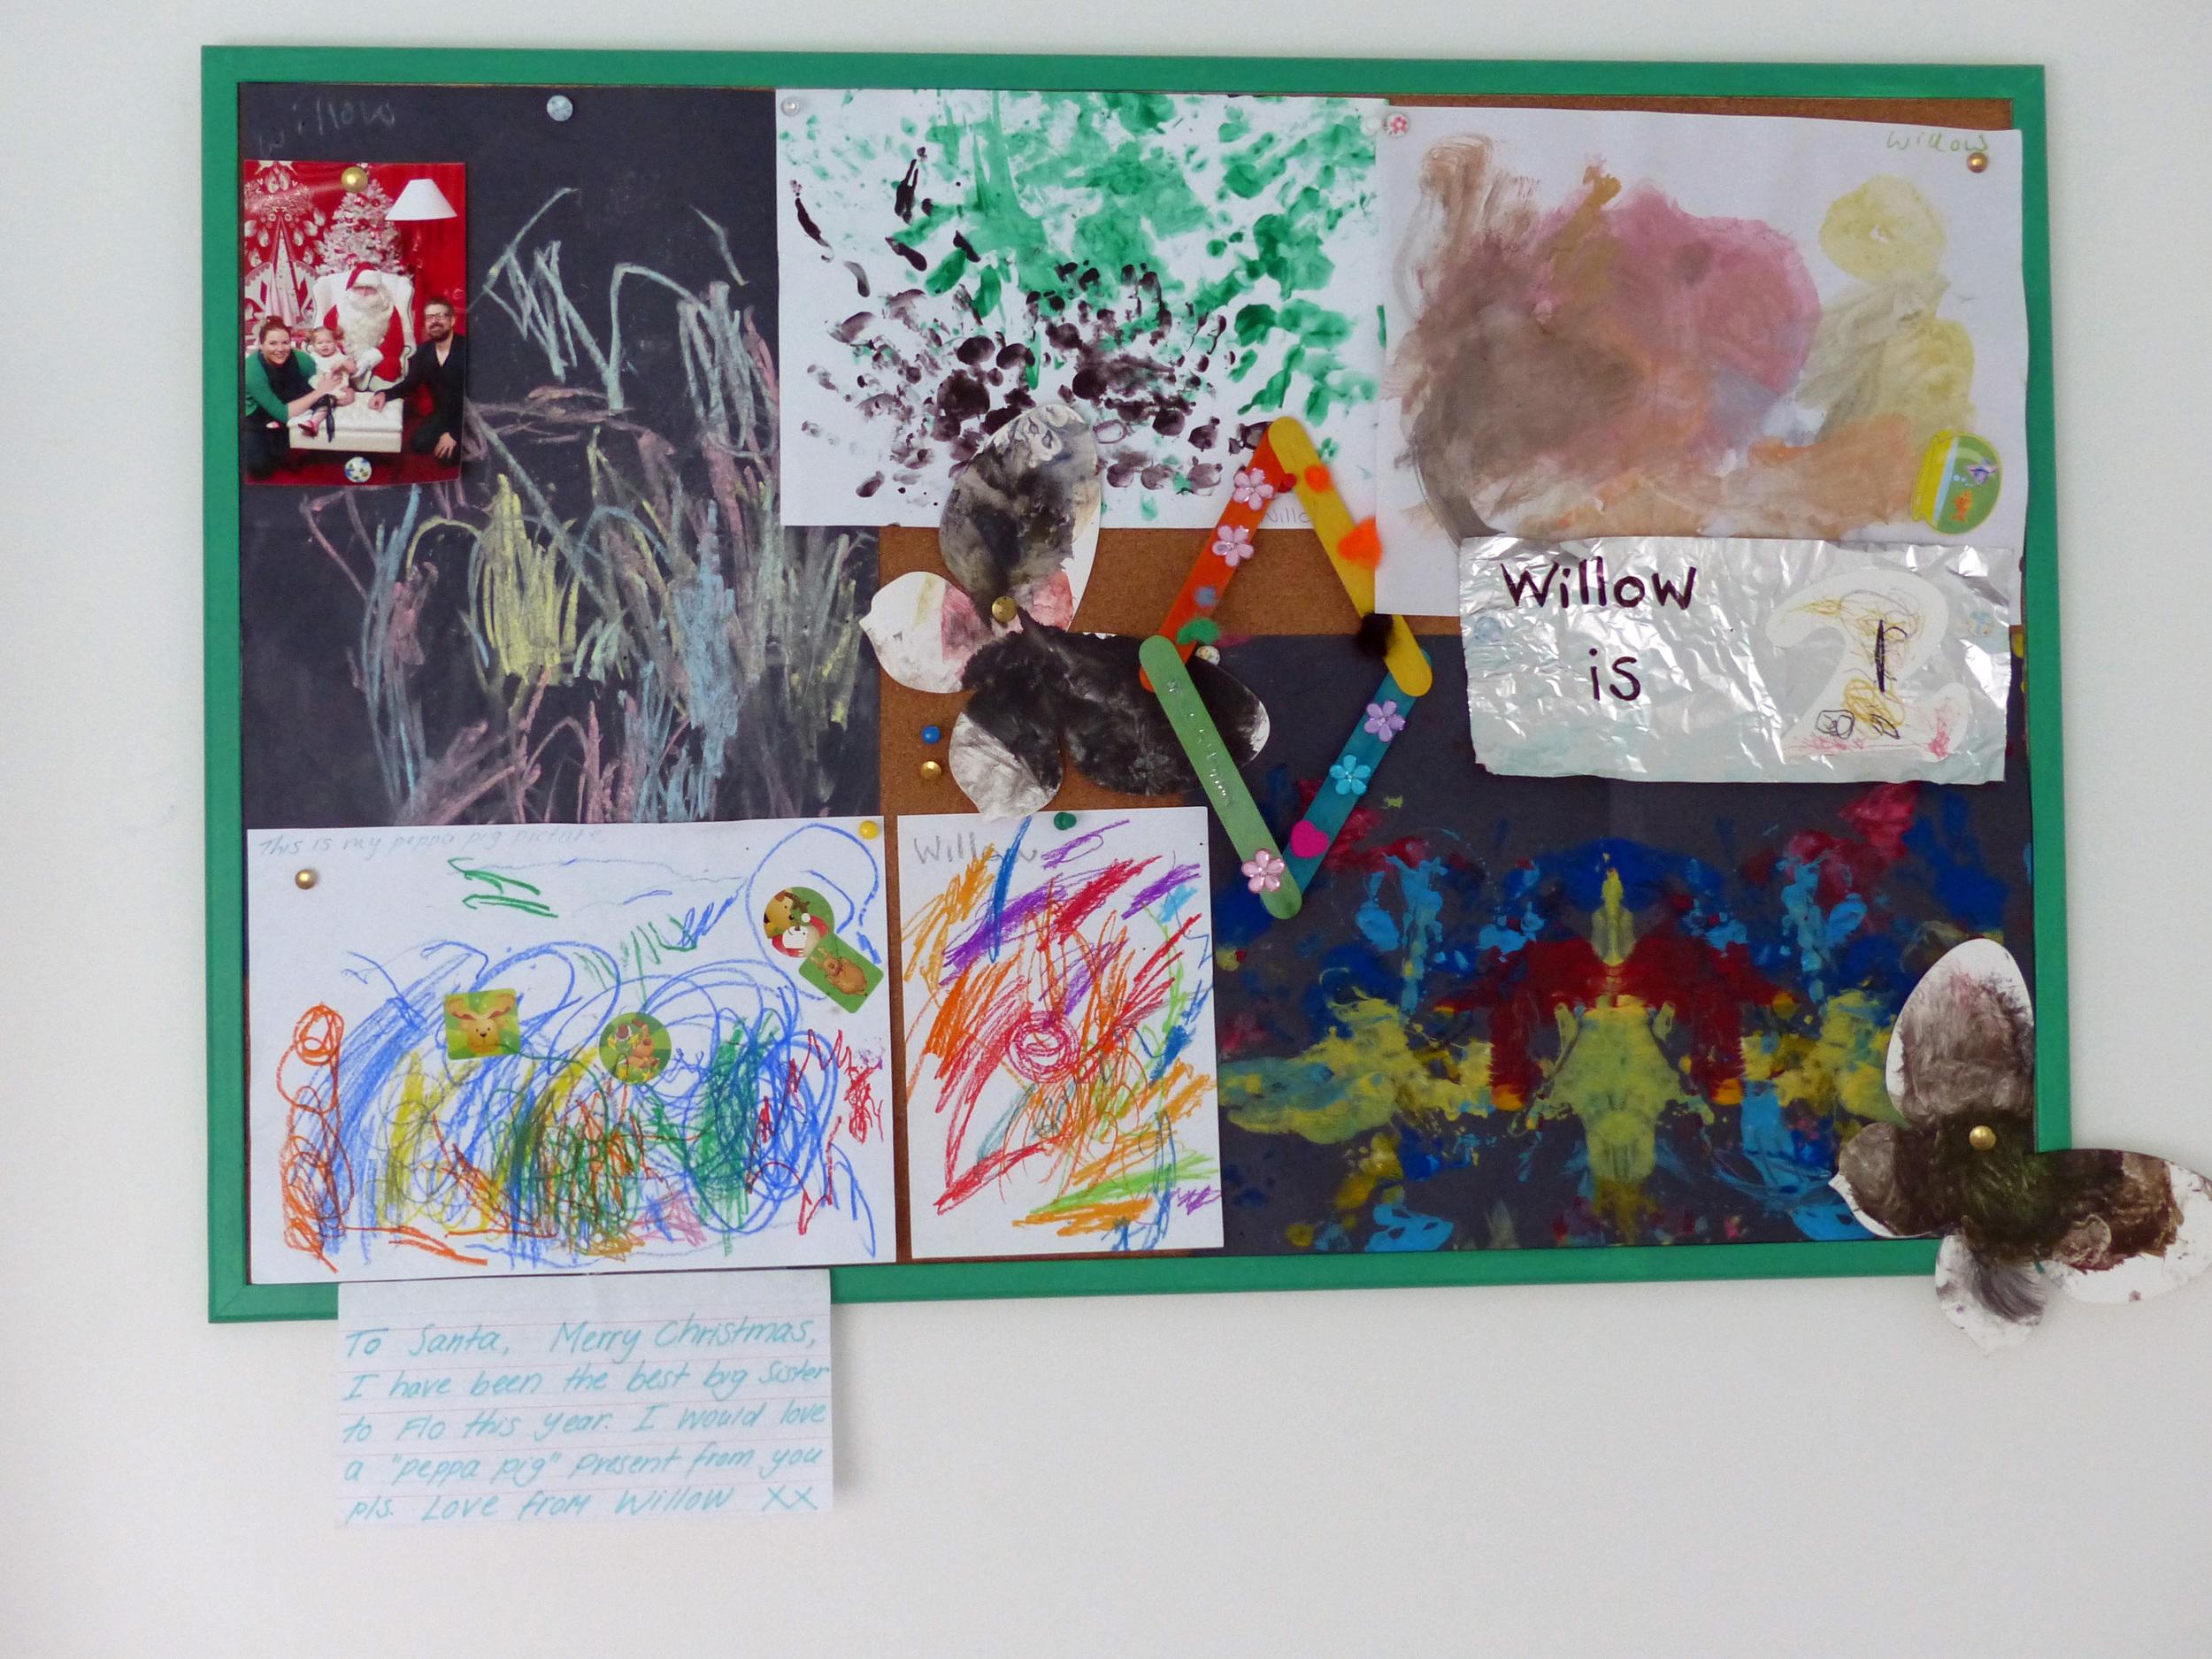 Willow's Artwork